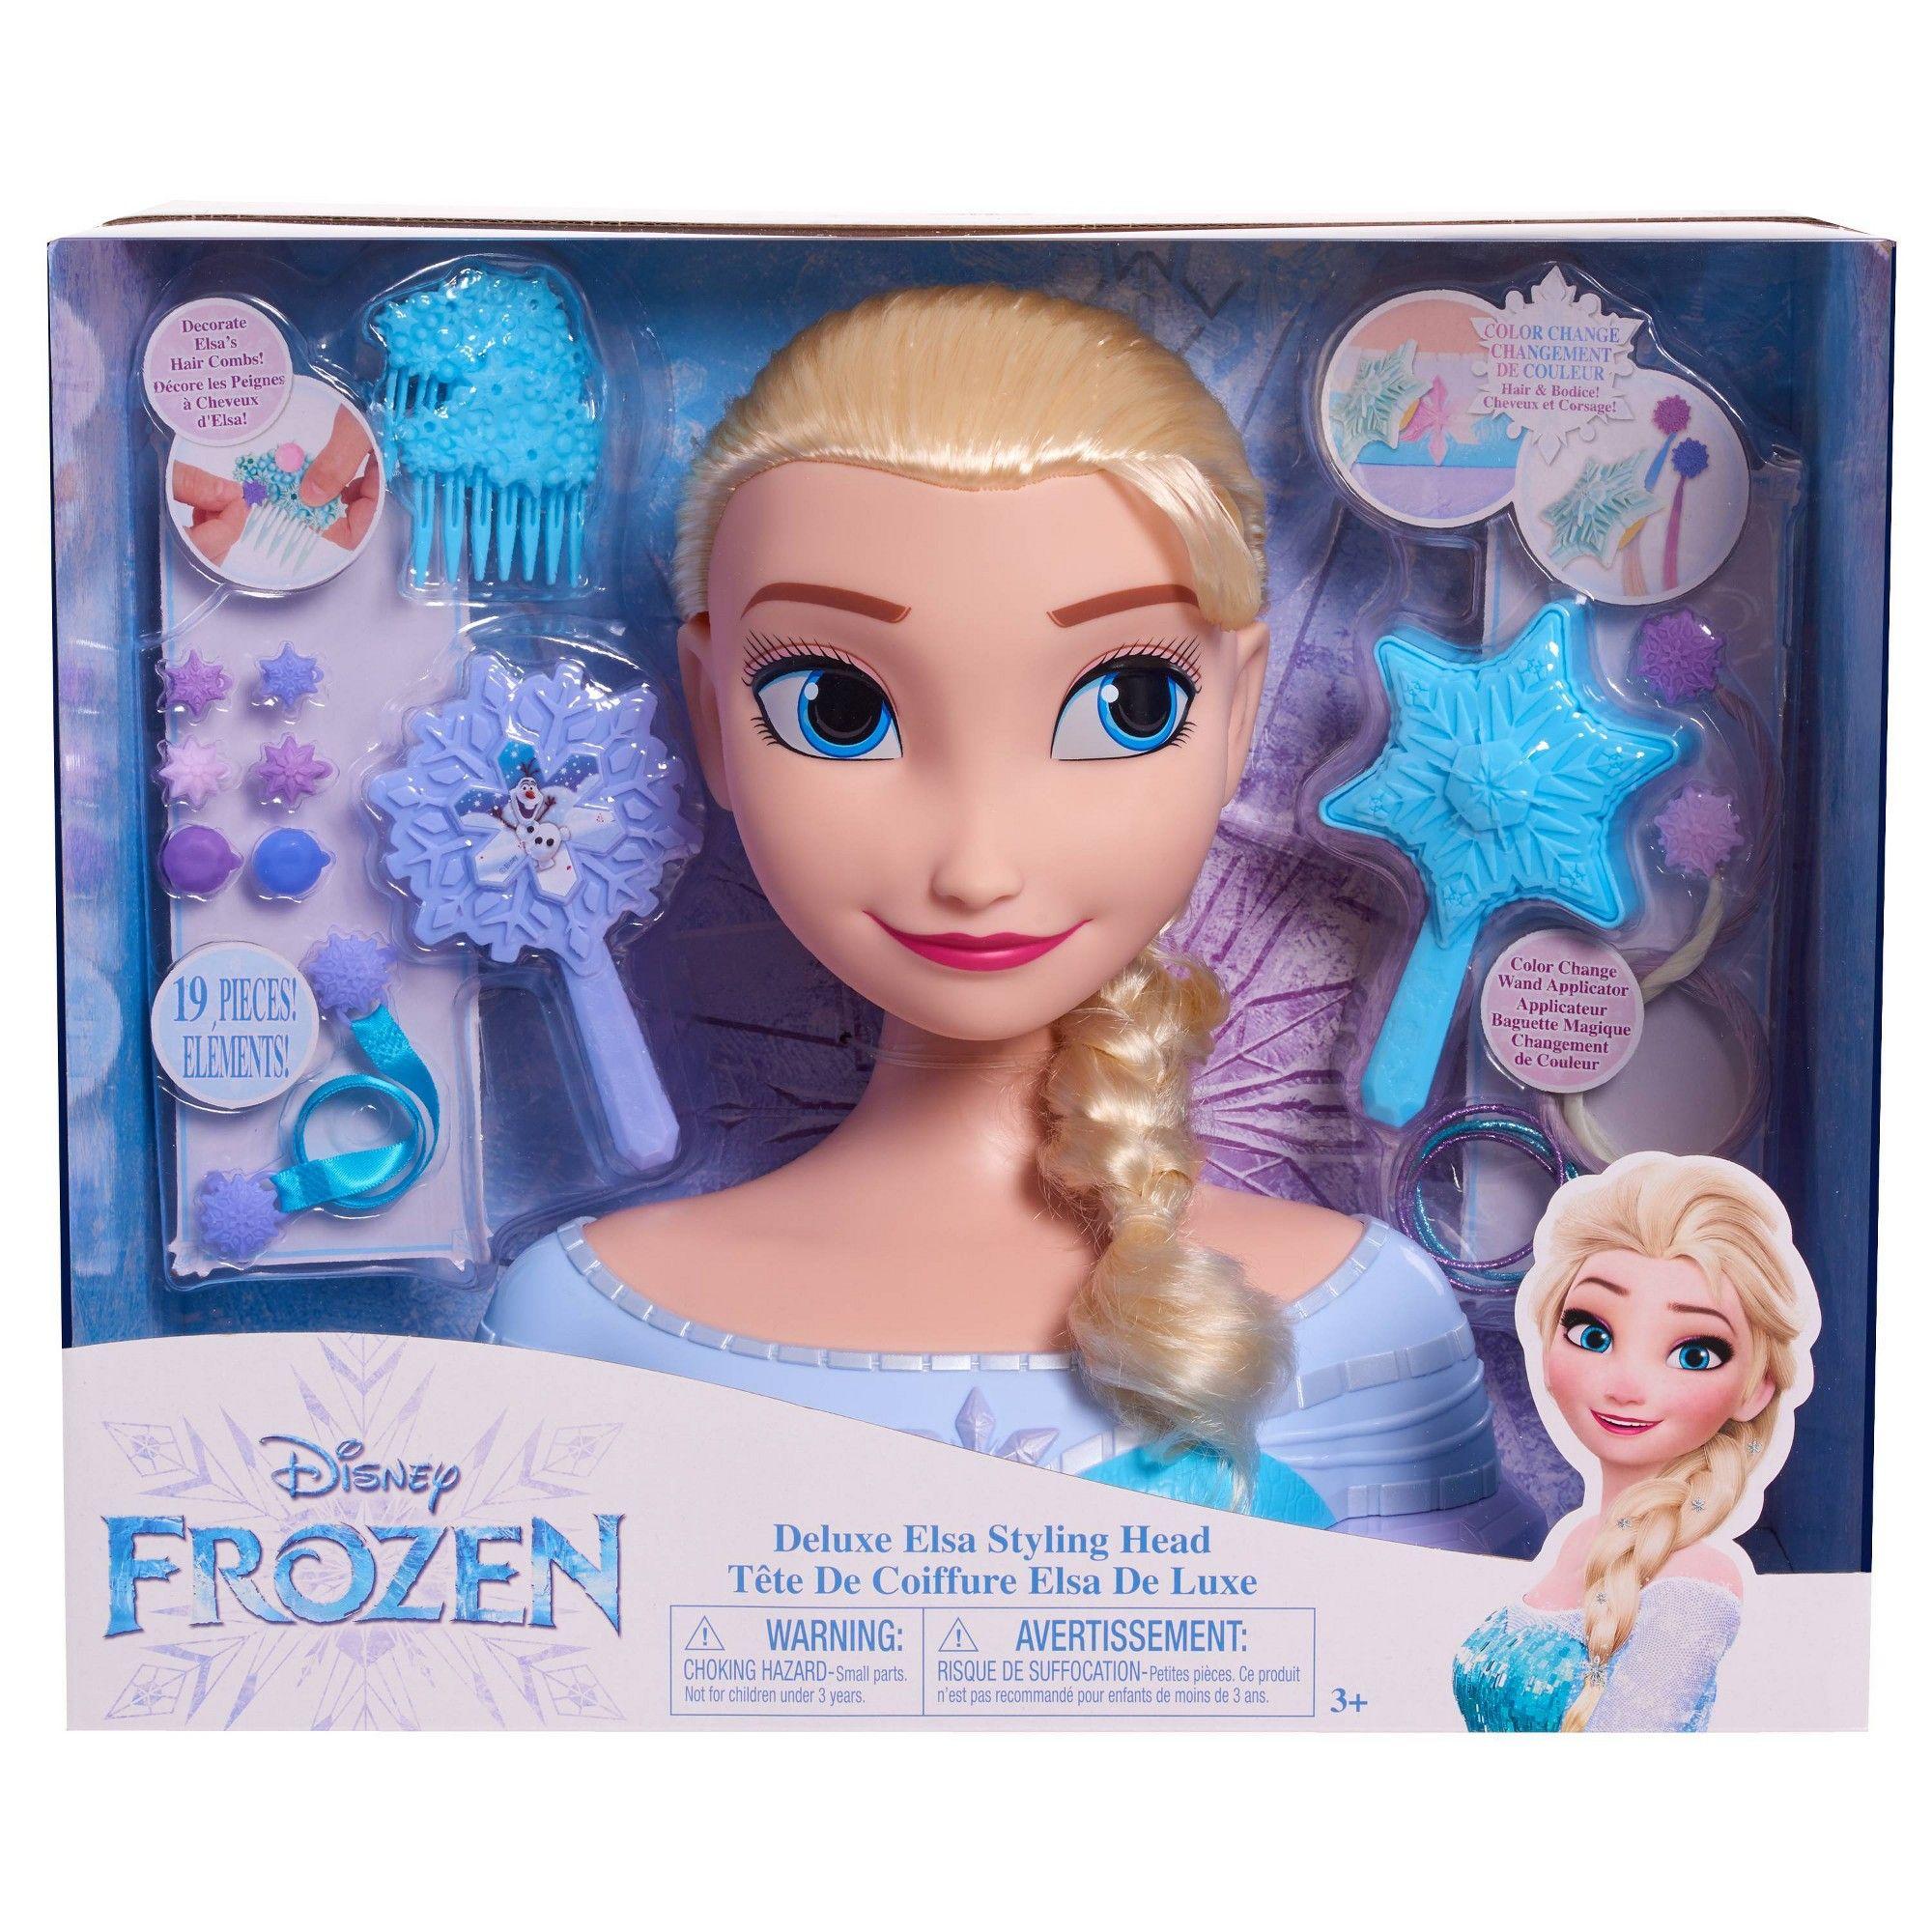 Disney Princess Elsa Deluxe Styling Head In 2020 Disney Princess Elsa Disney Frozen Birthday Party Disney Frozen Birthday